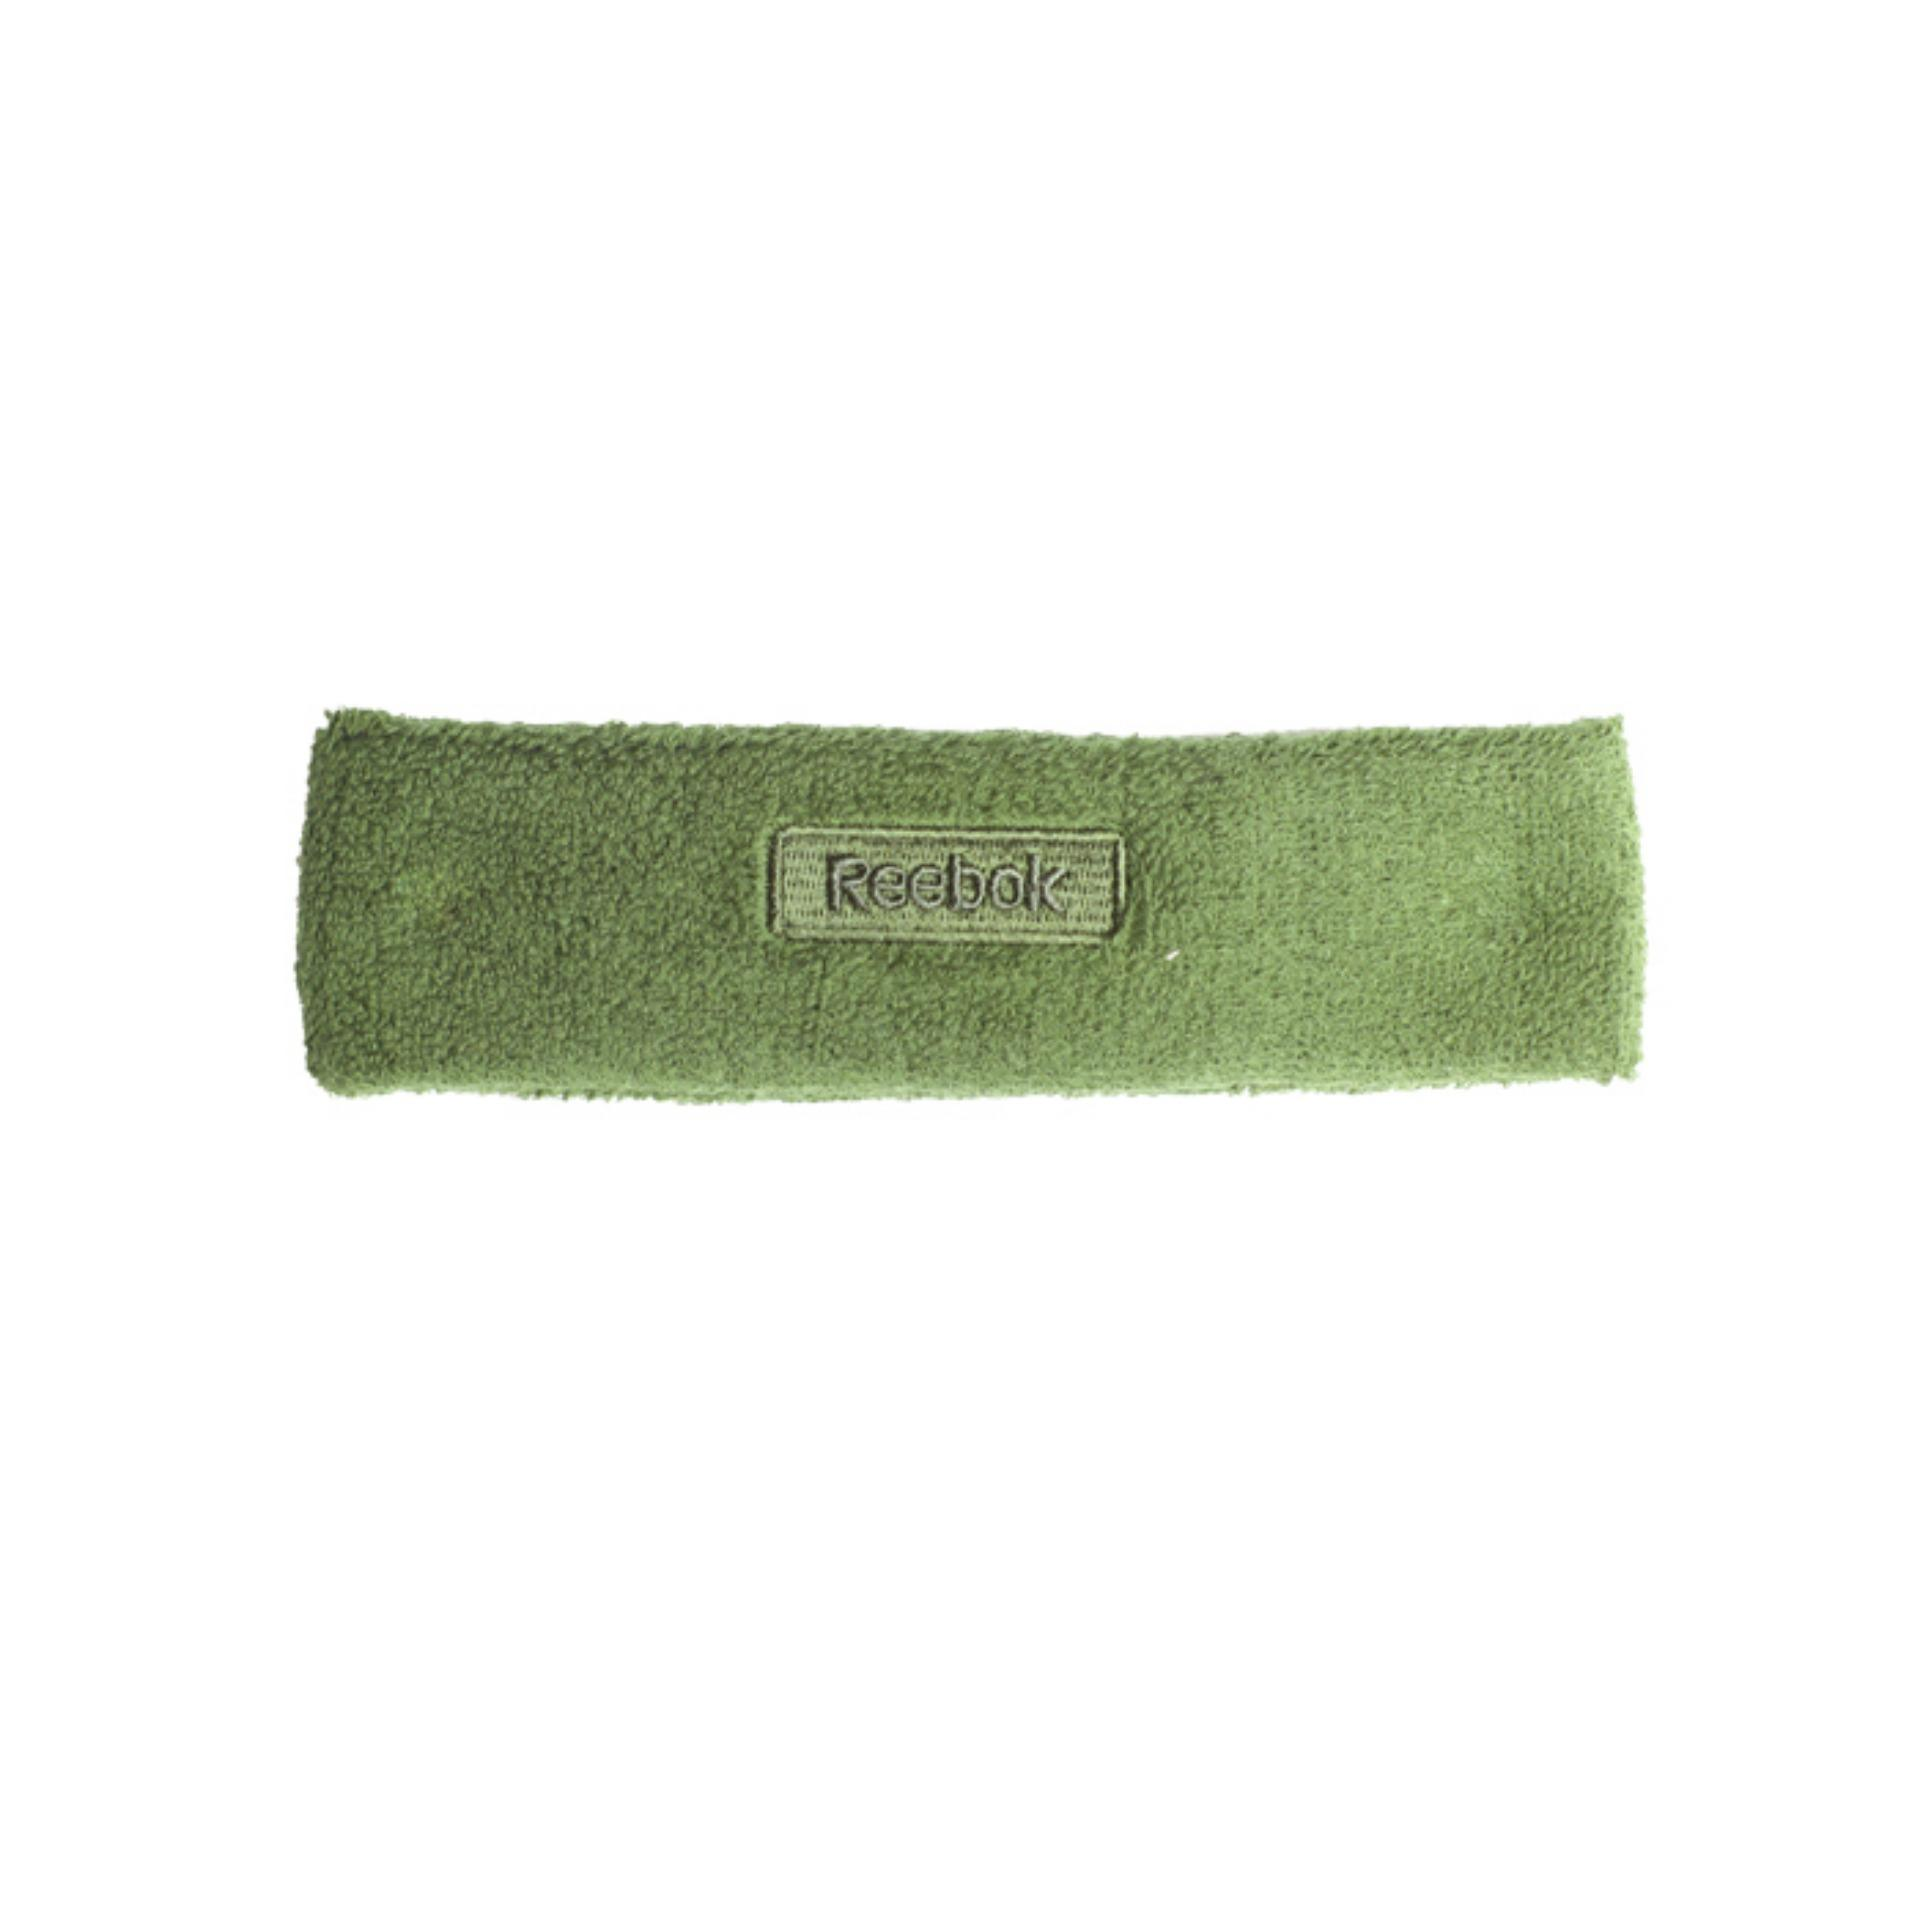 Pencari Harga Ikat Kepala OlahragaAksesoris OlahragaBasic Headband Reebok Warm Olive/Vital Green-H5028 terbaik murah - Hanya Rp51.154